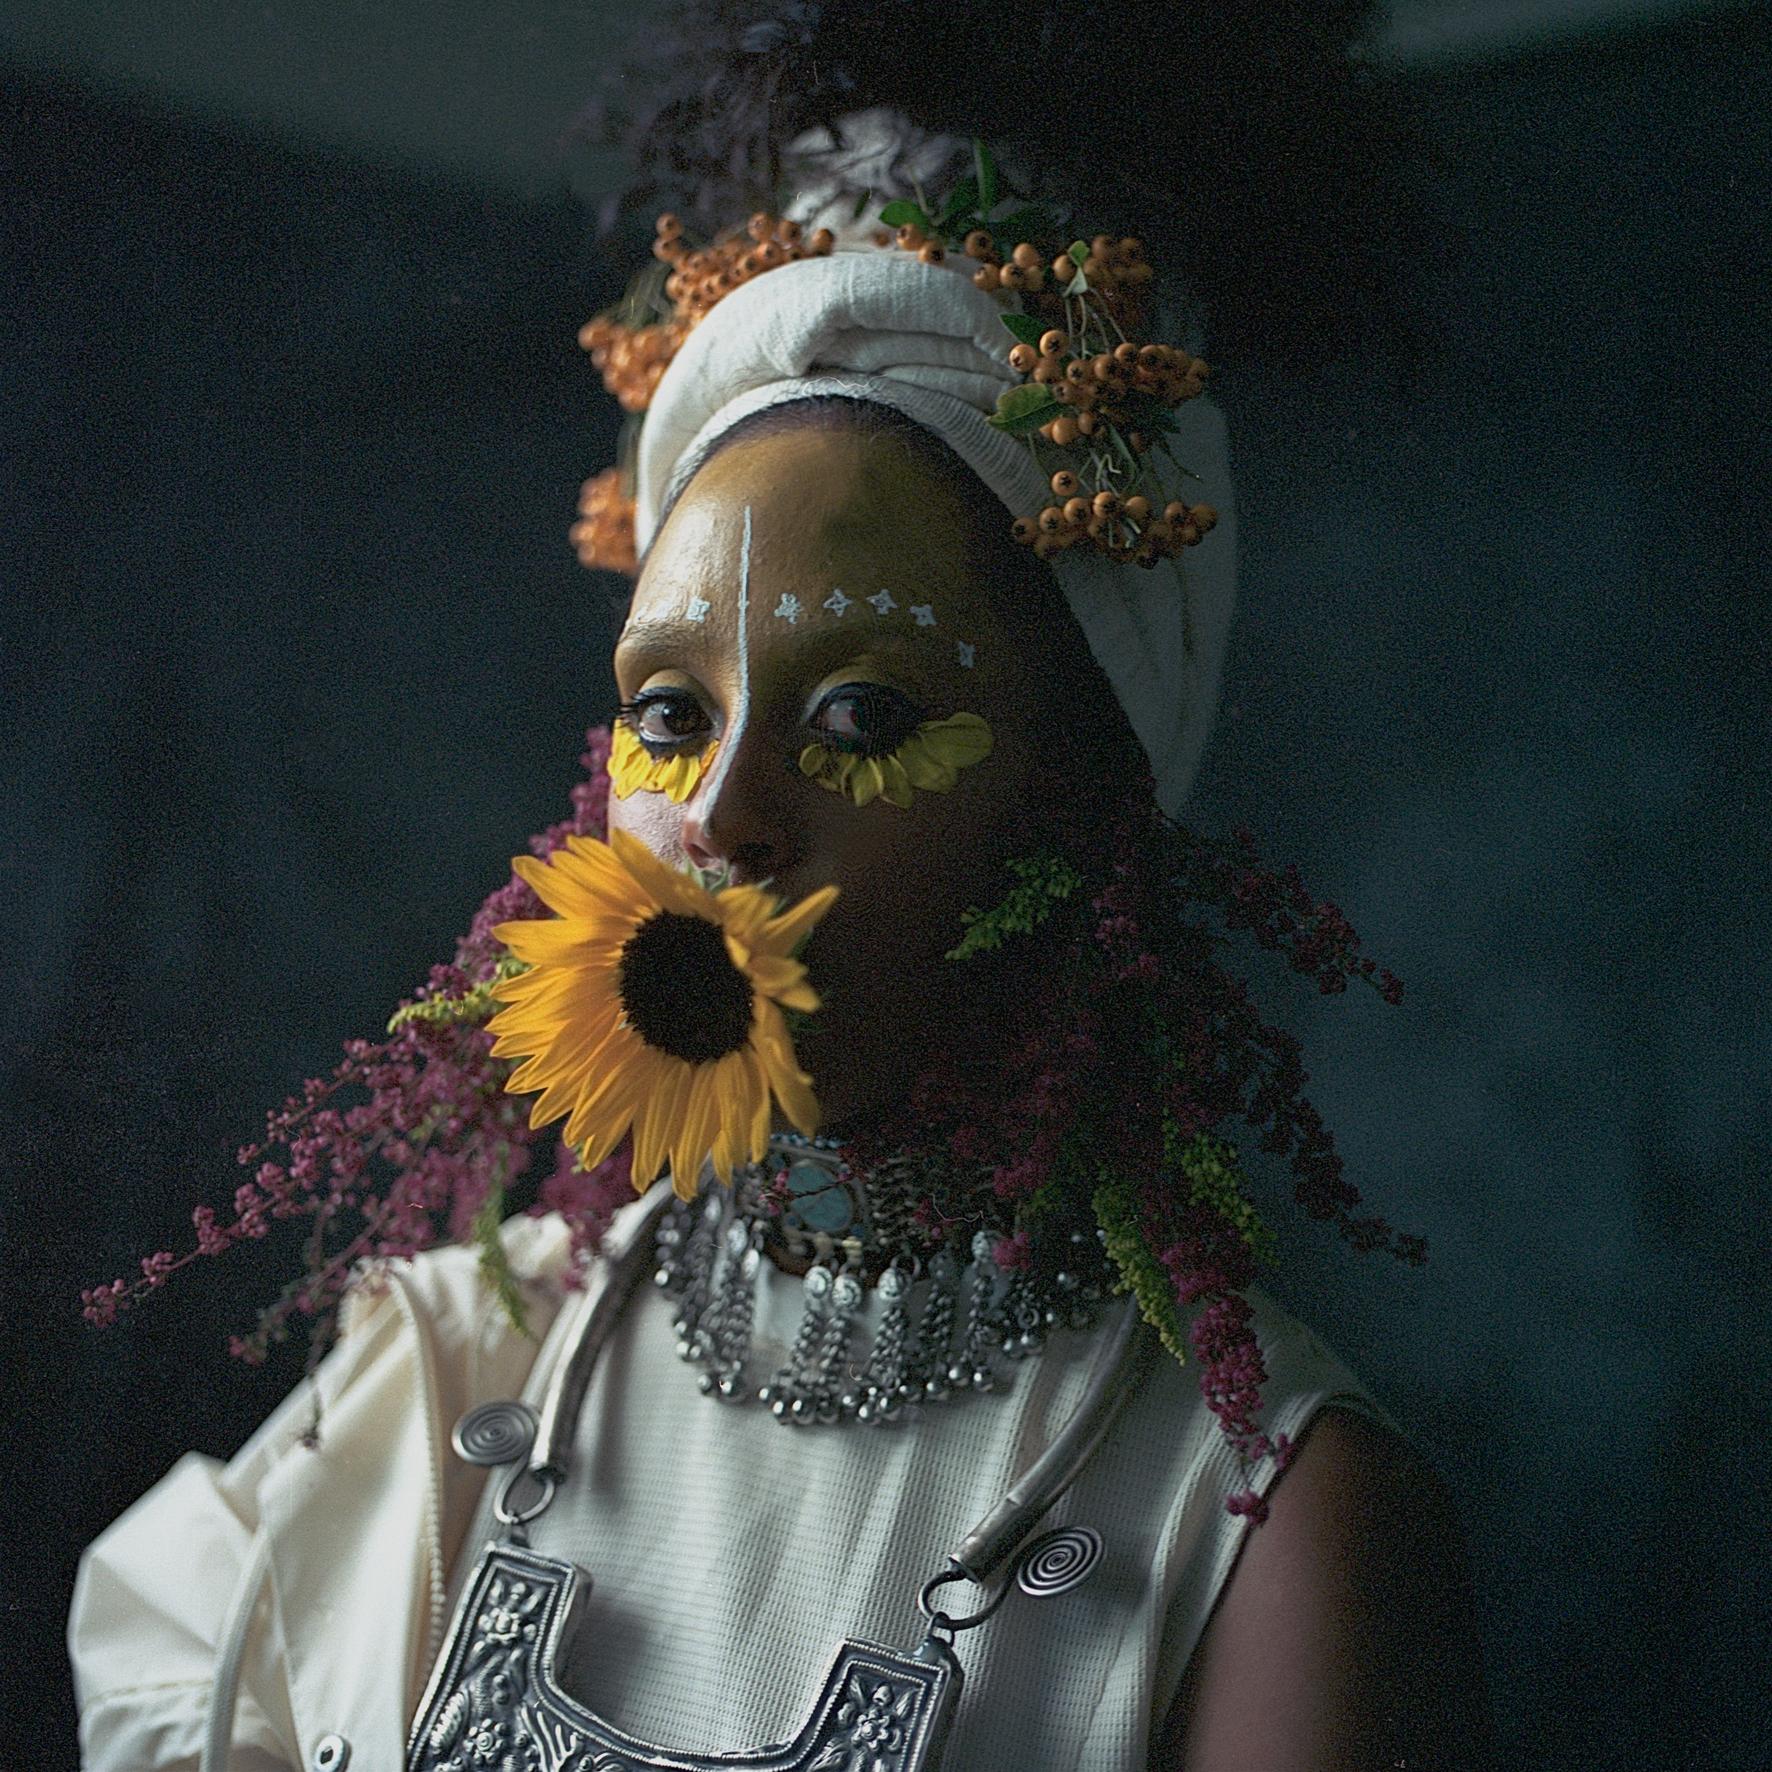 Hejira (c Bruce Collier